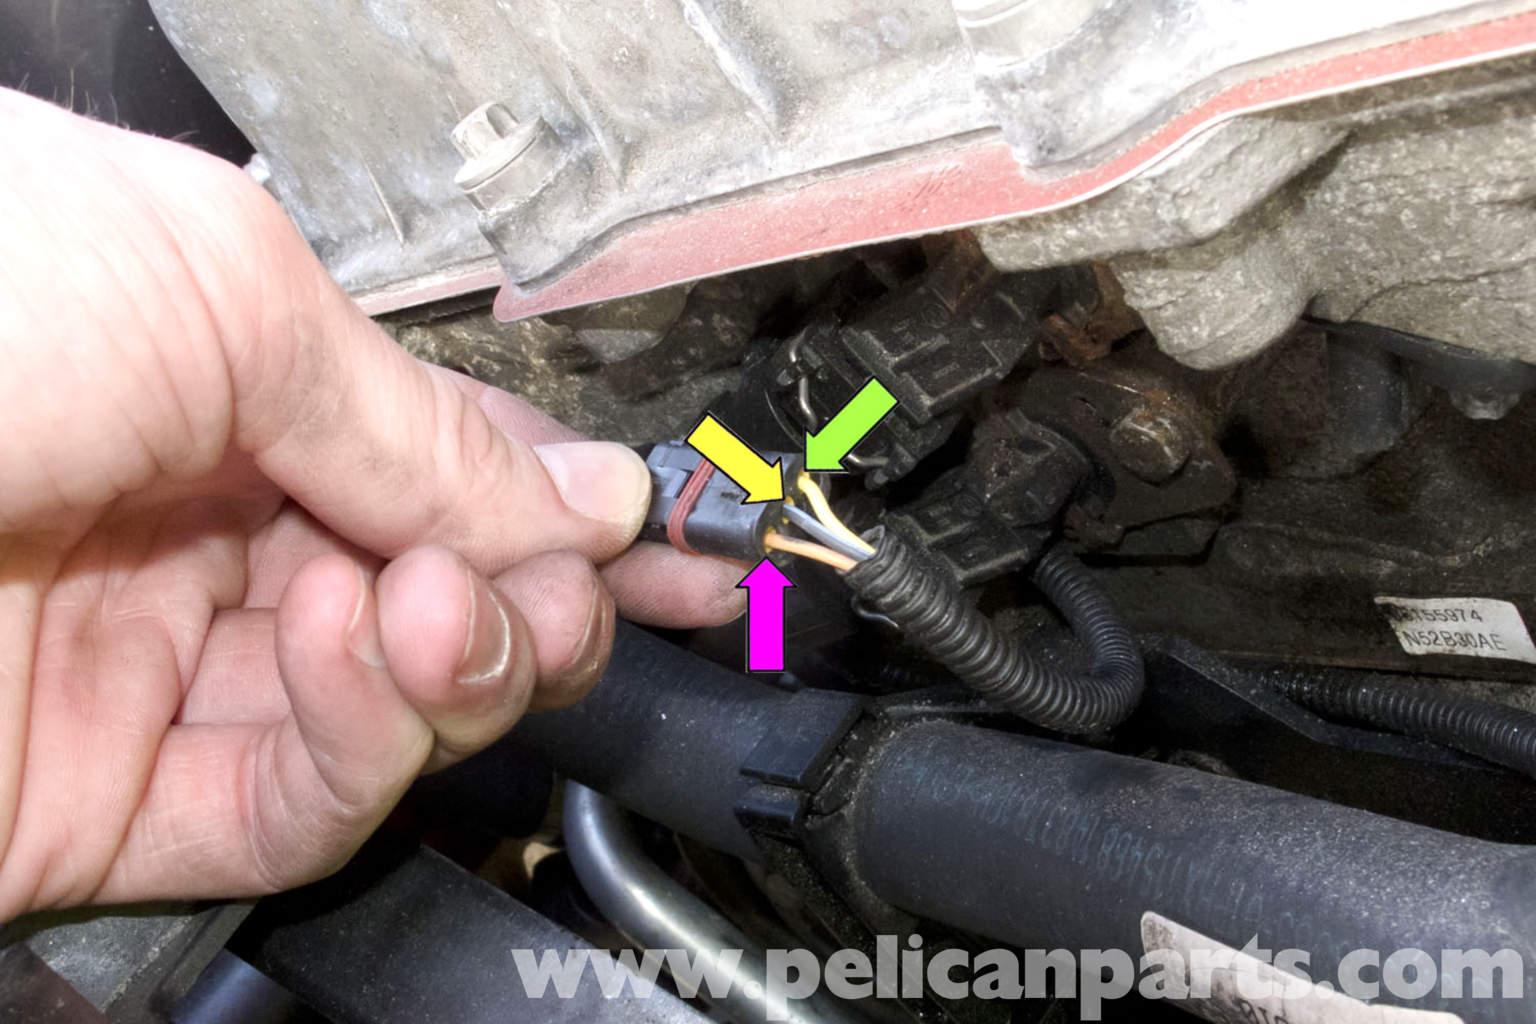 Sensor Wiring Diagram Pin Connector Is Pin 1 Yellow Pin 2 Red Pin 3